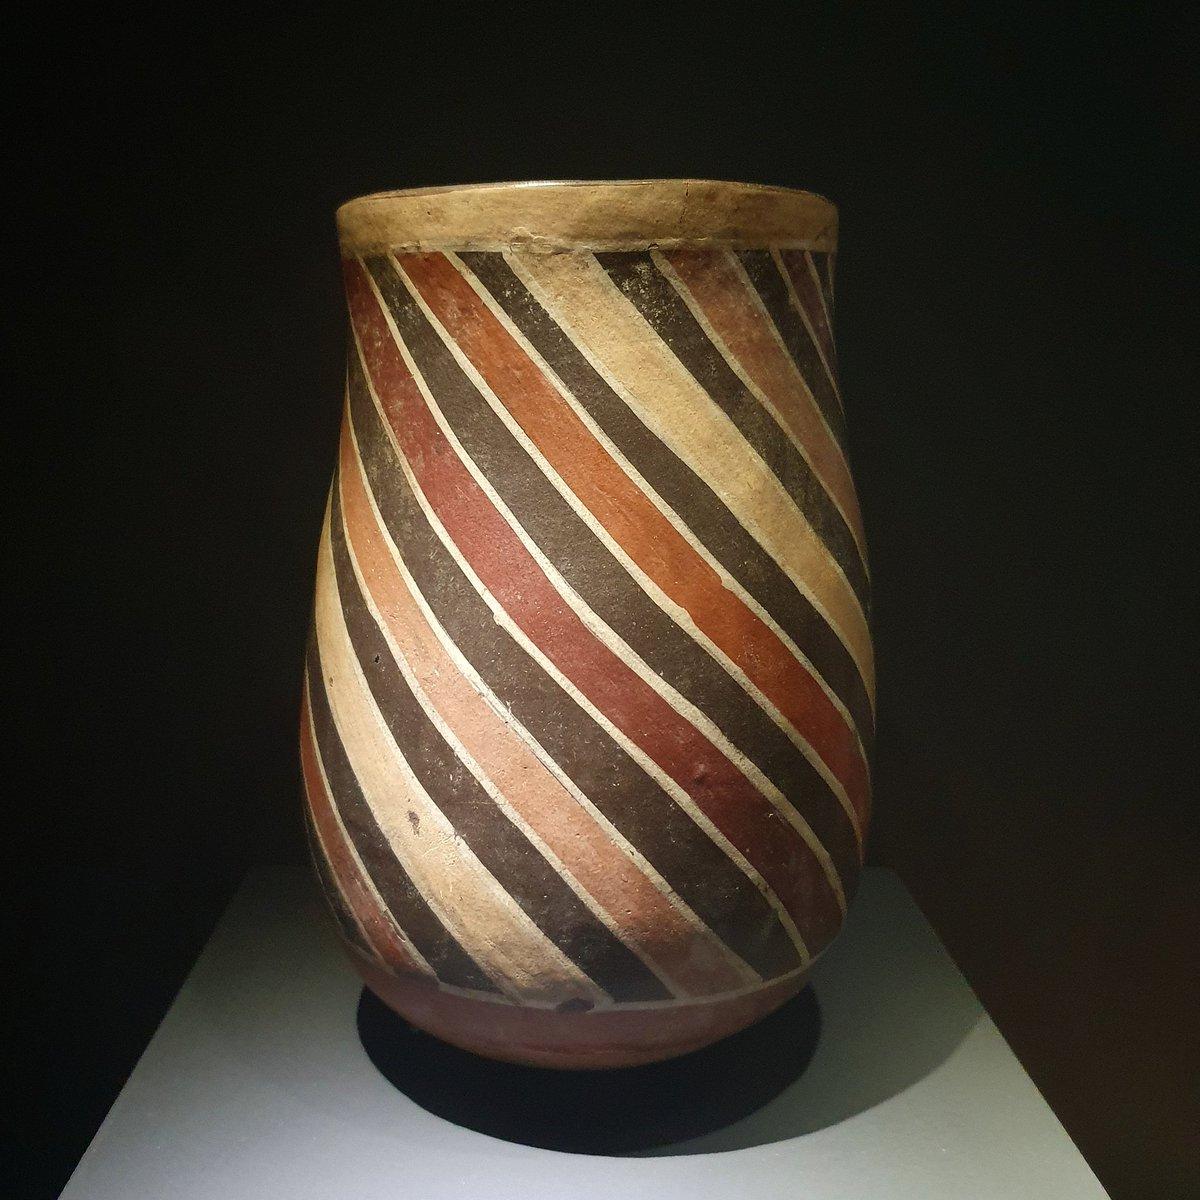 Vase, Nasca culture, southern coast of Peru, 100-600 CE, terracotta. https://t.co/xiTy4UiTYI